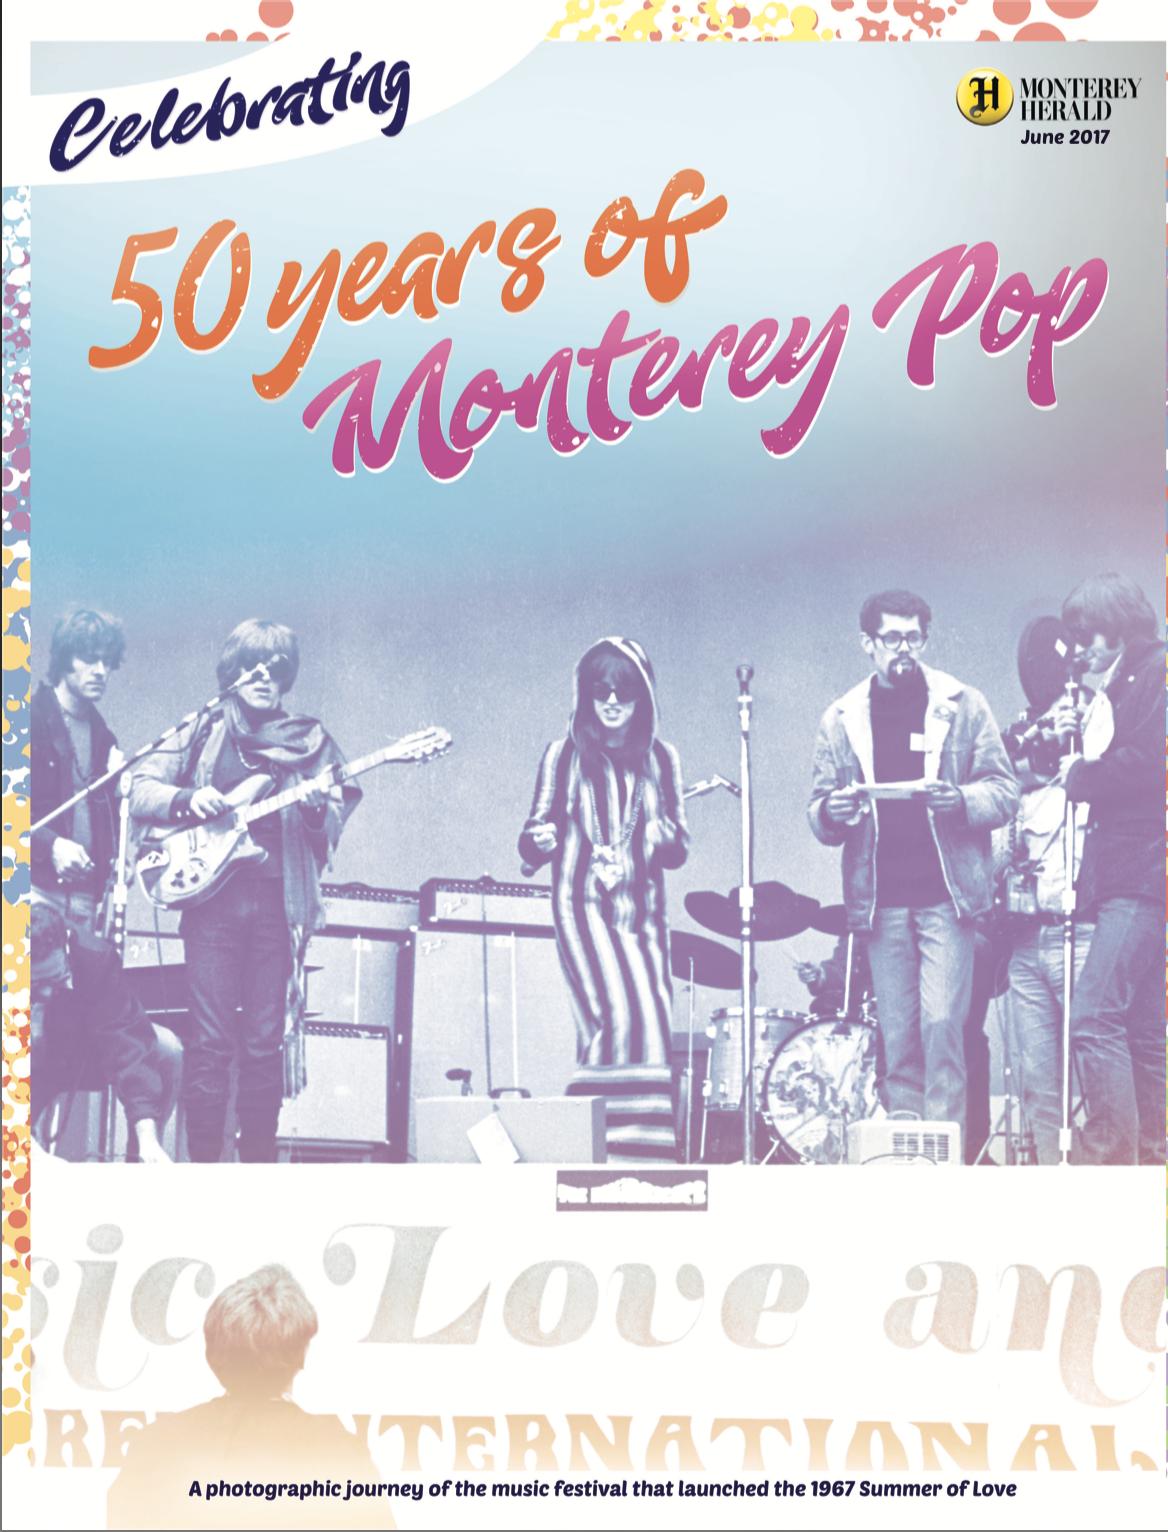 Celebrating 50 Years of Monterey Pop